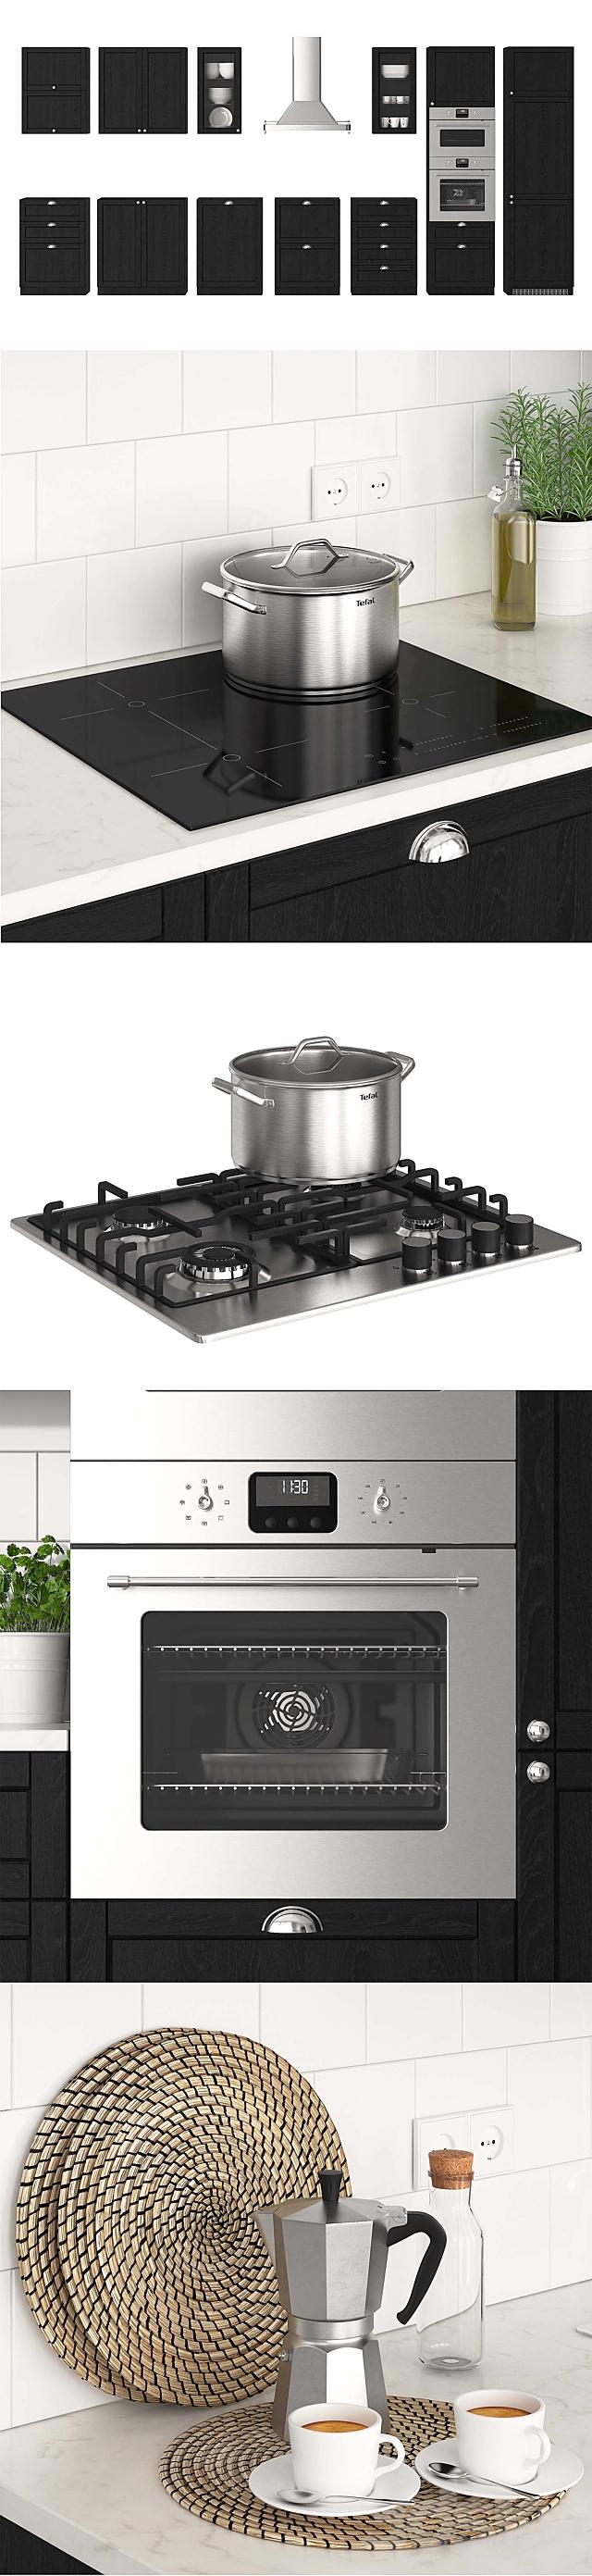 Ikea Metod Lerhyttan